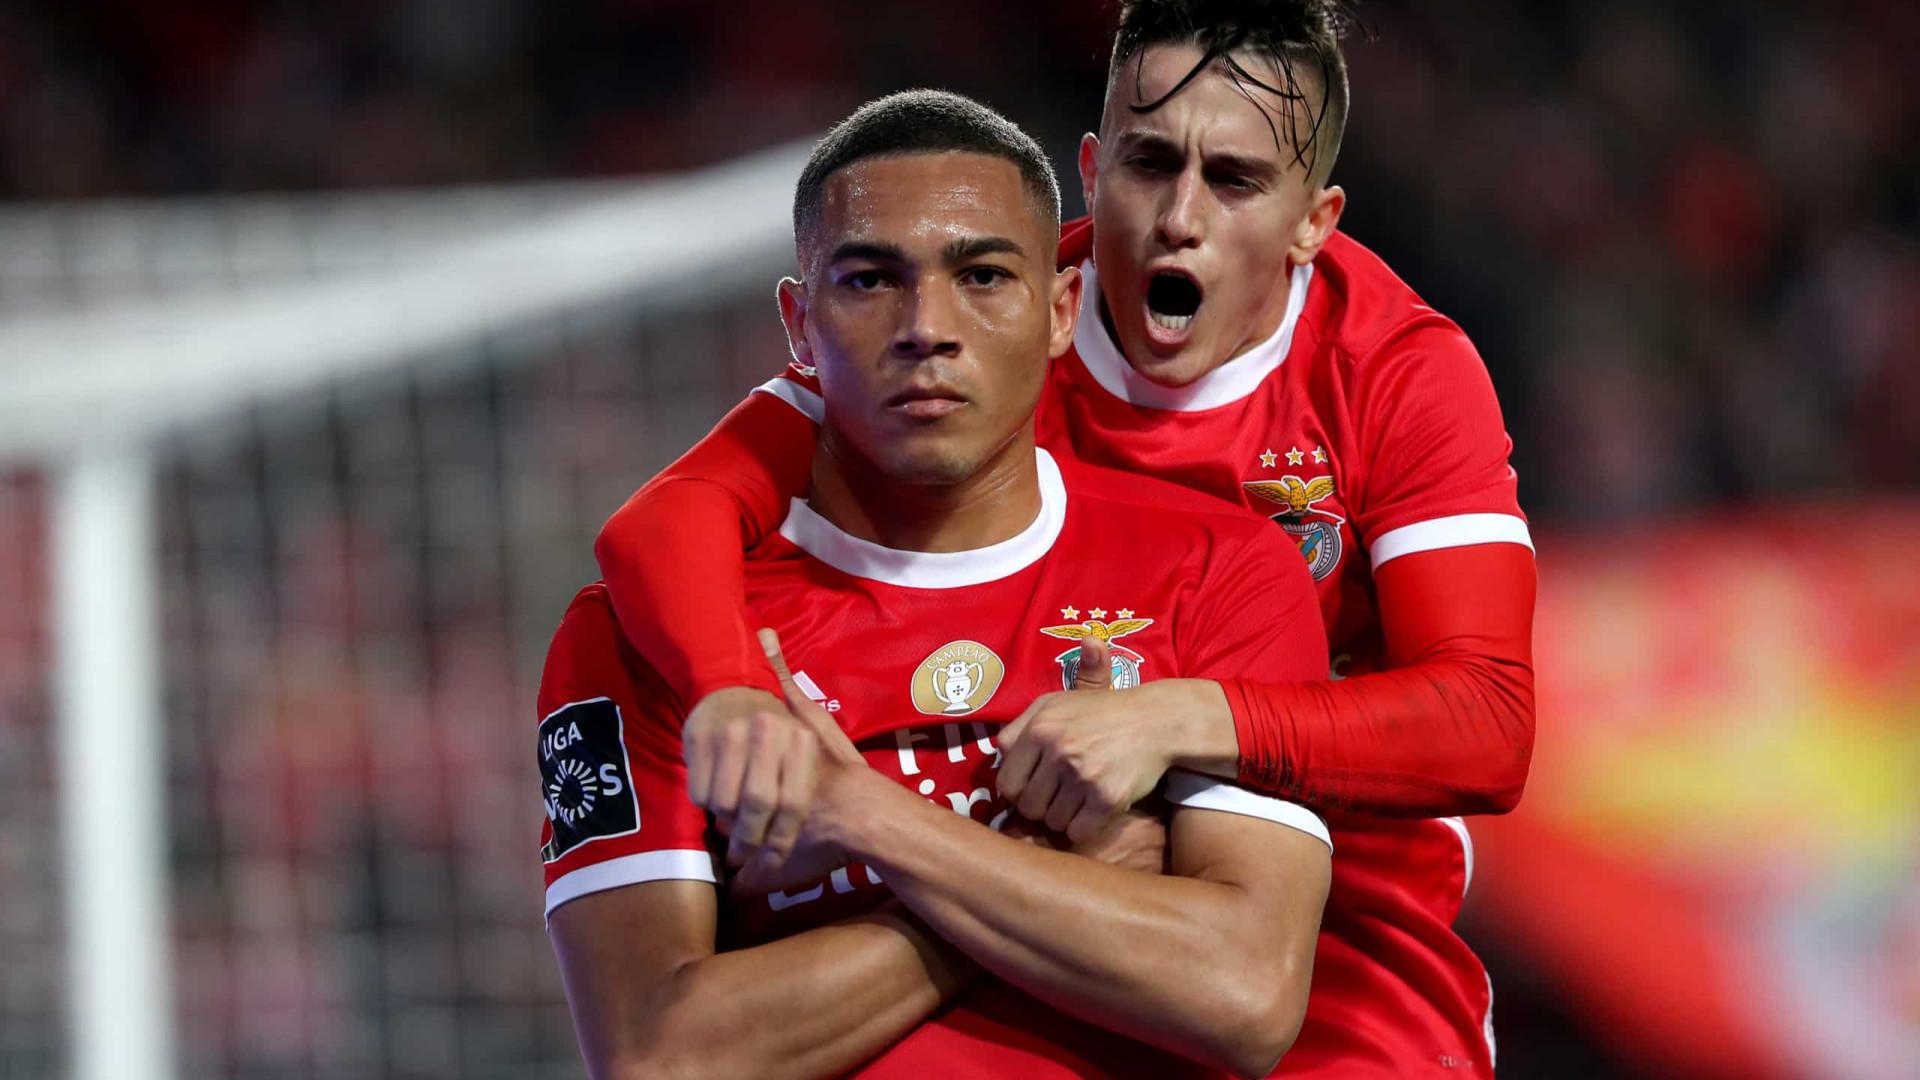 [3-0] Benfica-Famalicão: Pizzi bisa no encontro